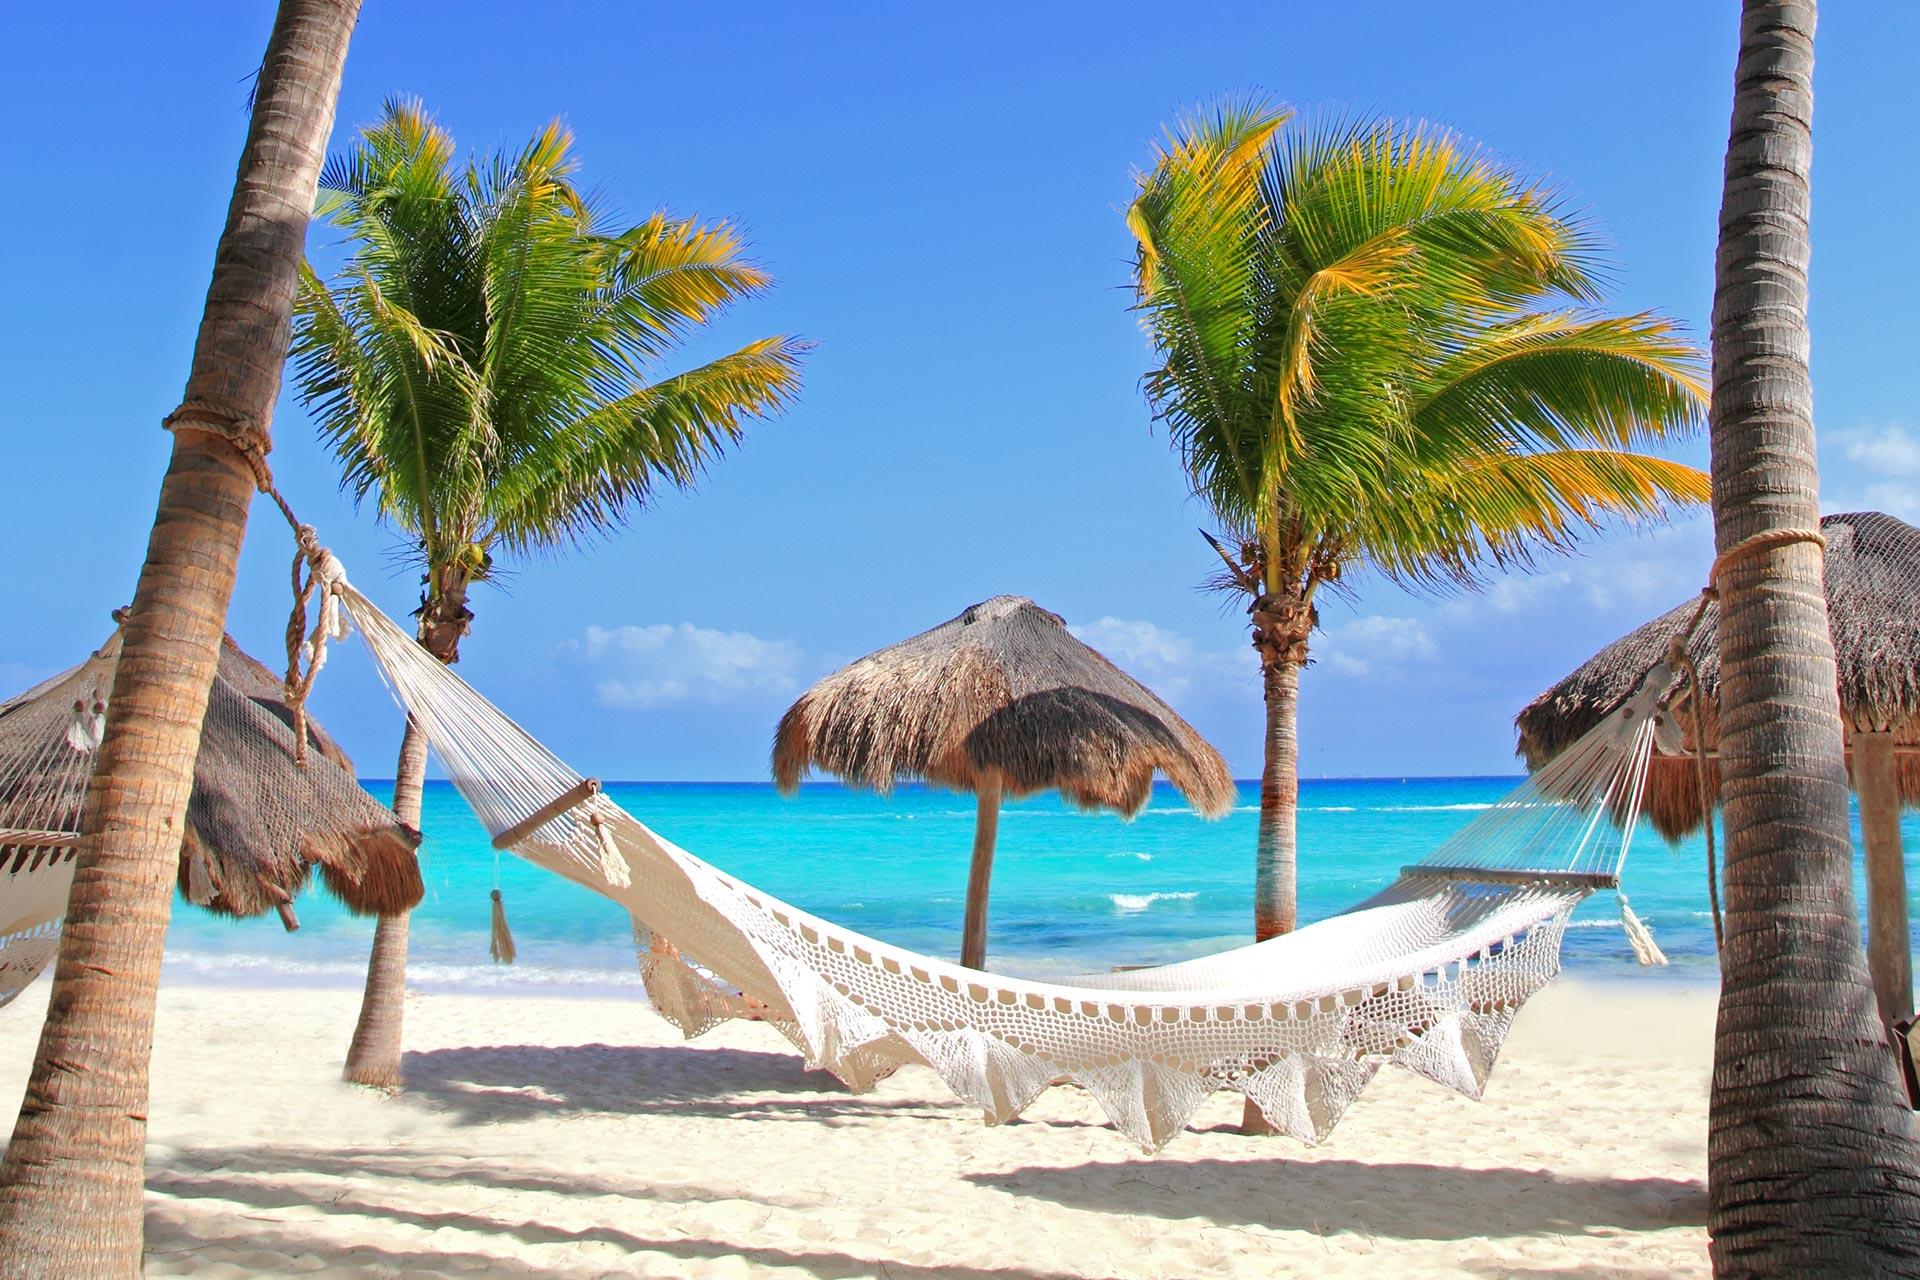 Revelion 2022 - Sejur plaja Bahia Principe Resort, Riviera Maya, Mexic, 9 zile